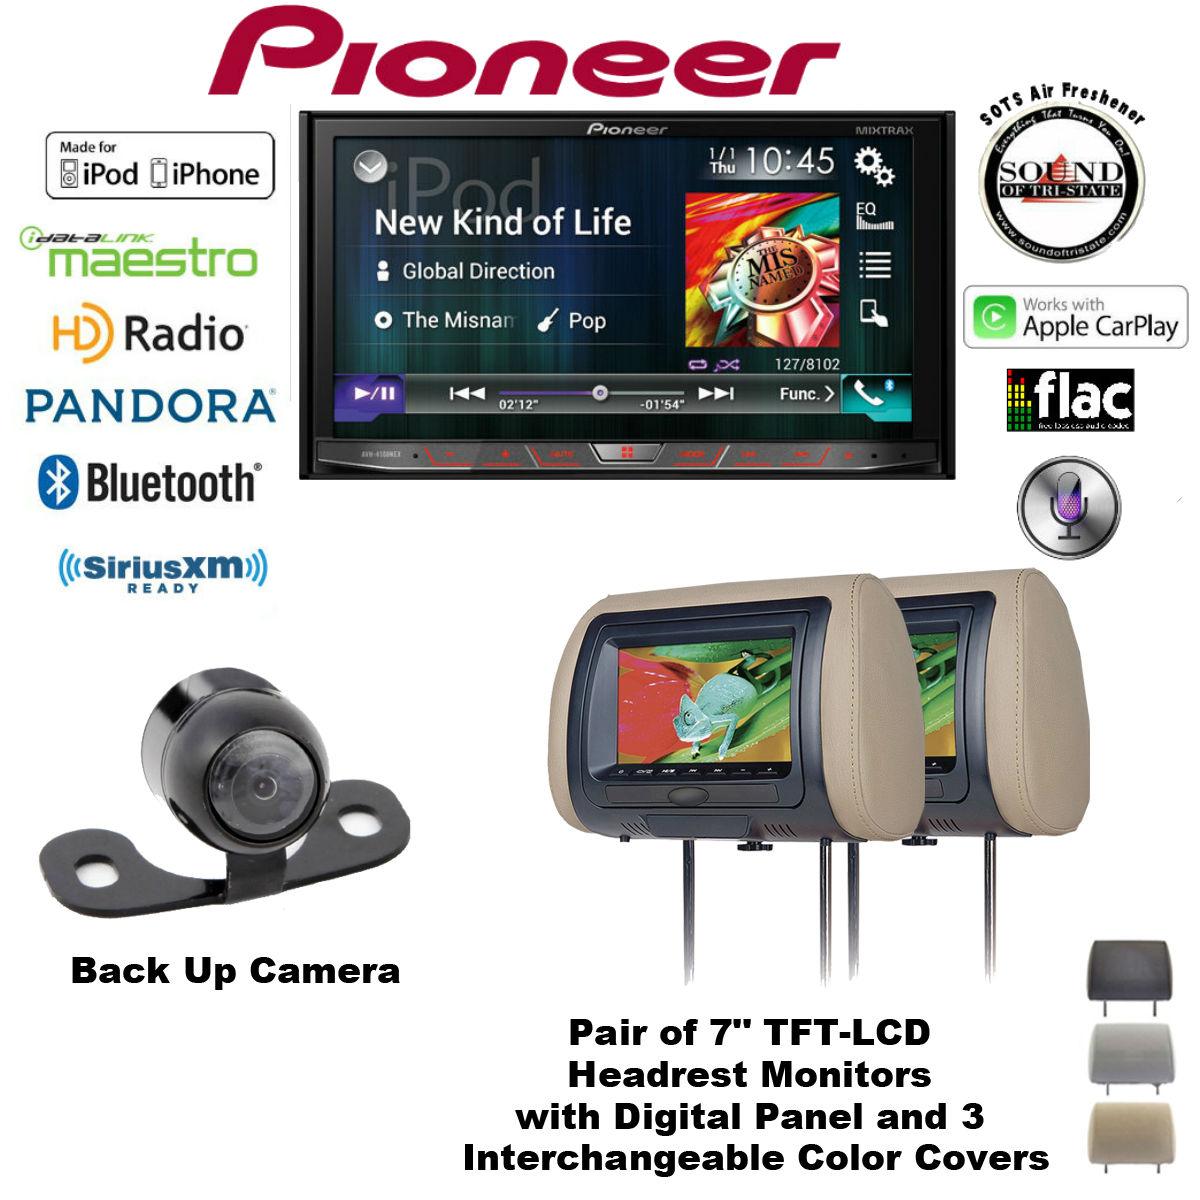 avh4100nex_cls700x2_sv6922mlii_freshner pioneer avh 4100nex flagship multimedia dvd receiver with 7\